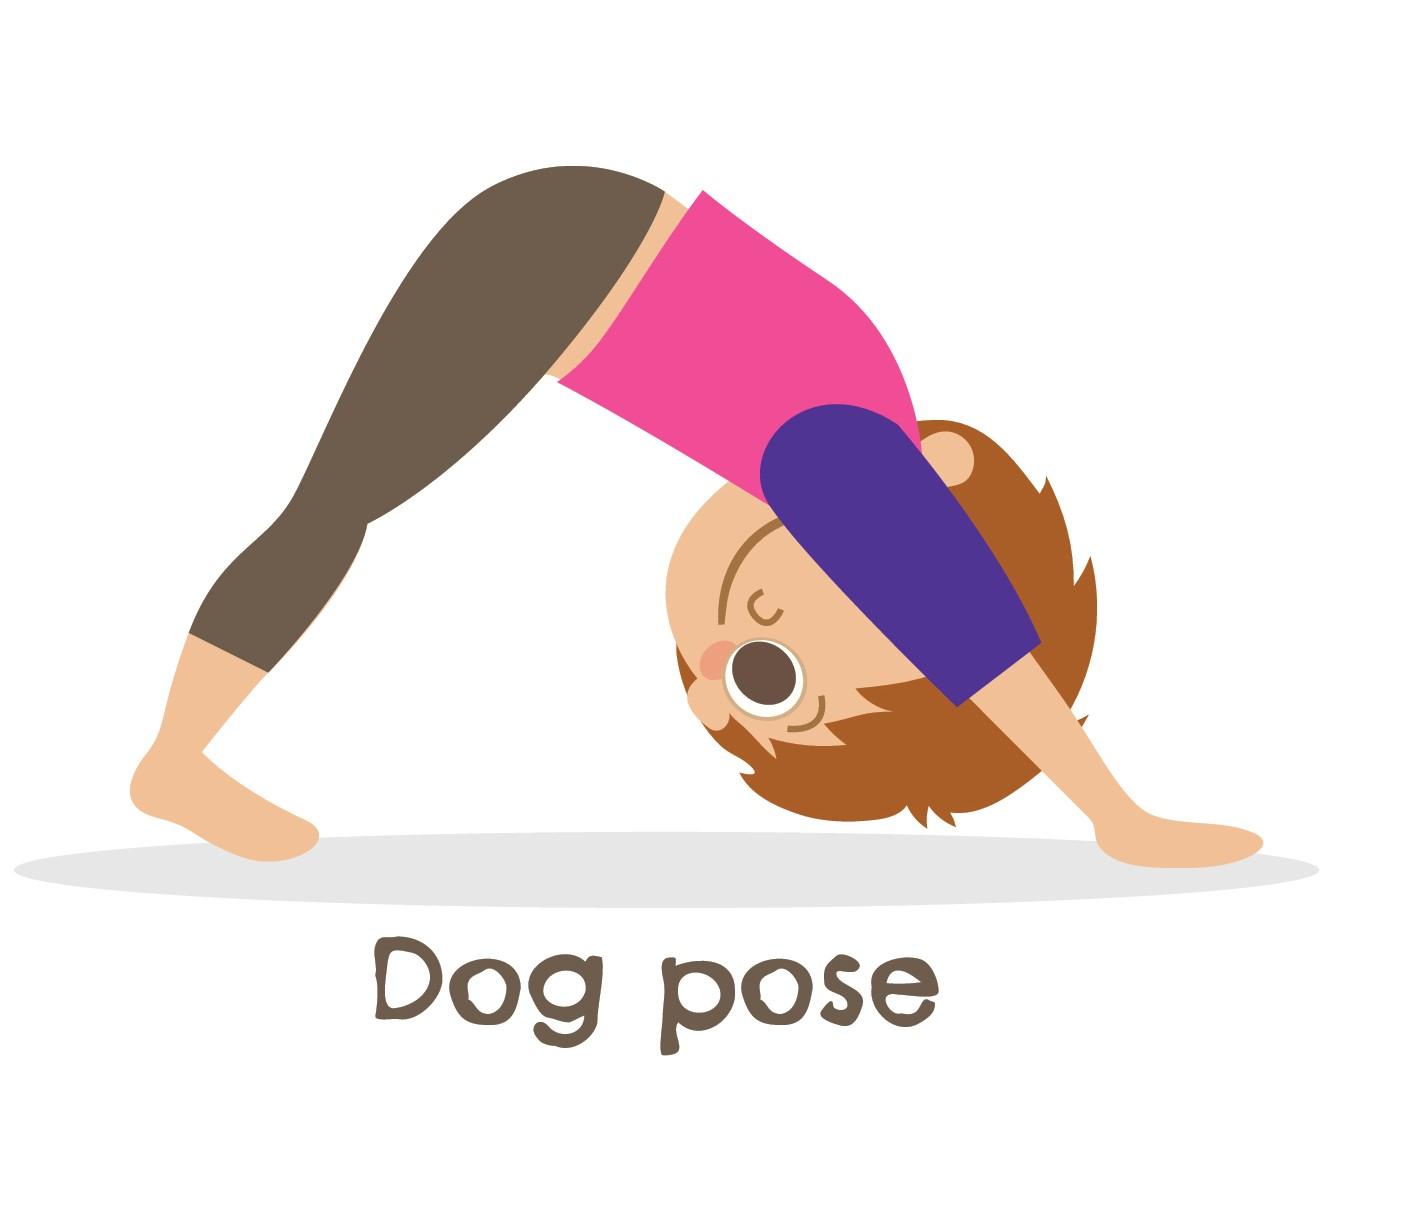 Dog Pose Kid's Yoga